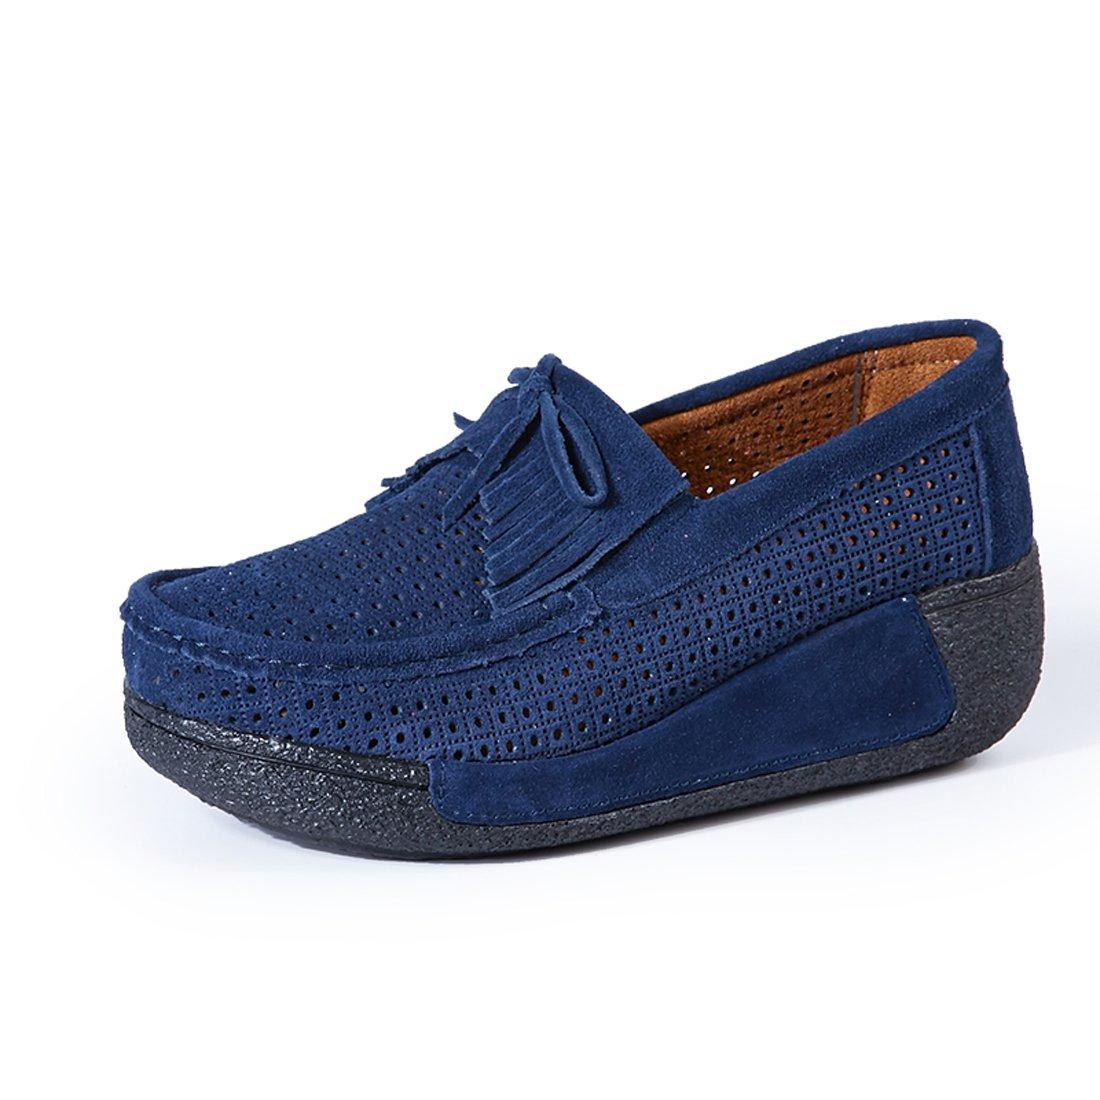 Z.SUO Mocassins Mocassins Femmes Suède 19993 Casuel Bleu.3 Confort Chaussures Loafers Bleu.3 459c6d1 - reprogrammed.space